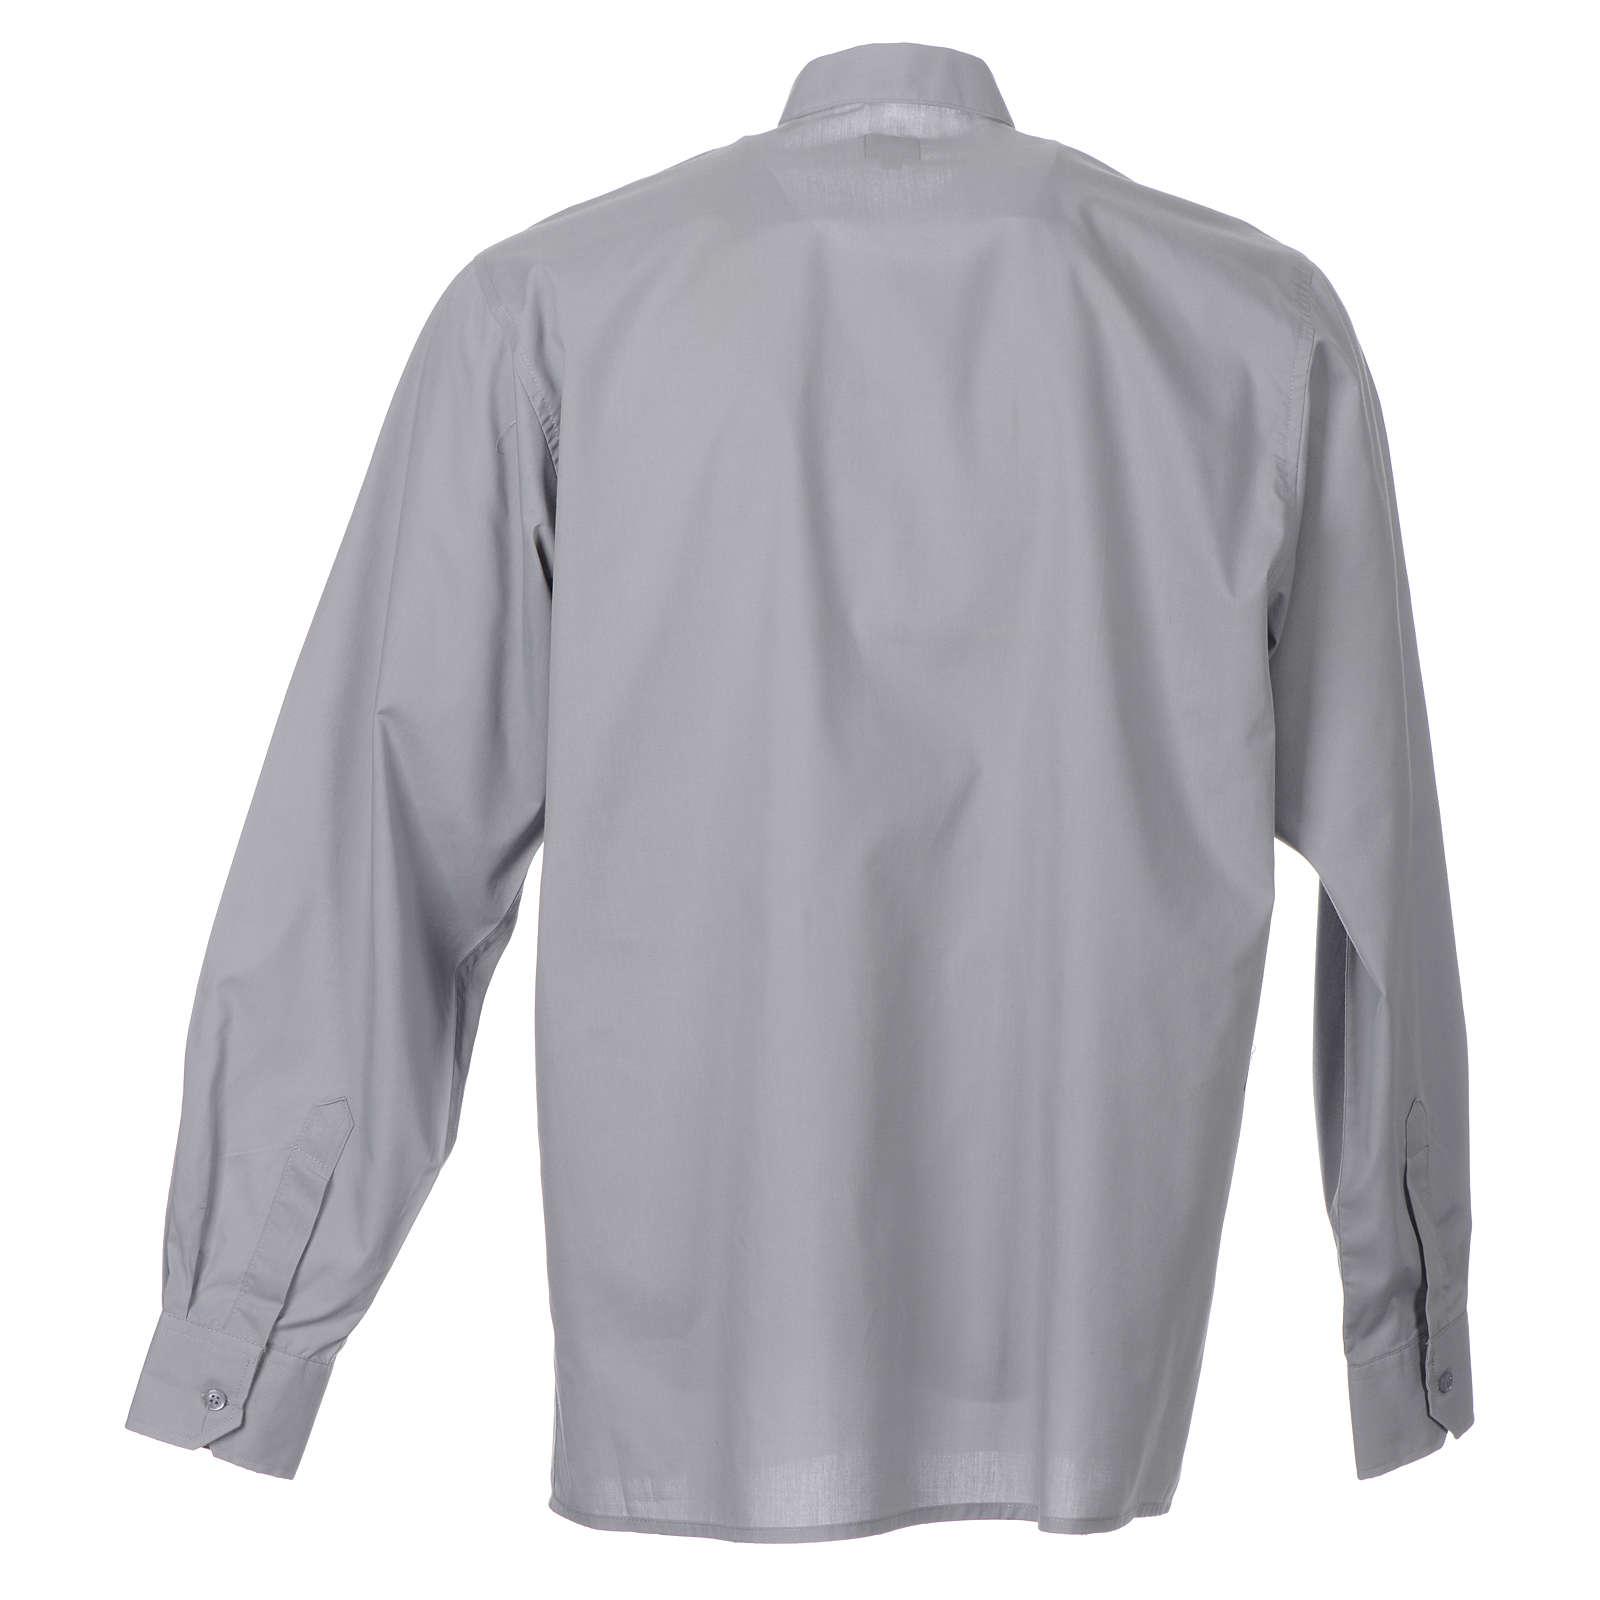 STOCK Camicia clergyman manica lunga popeline grigio chiaro 4